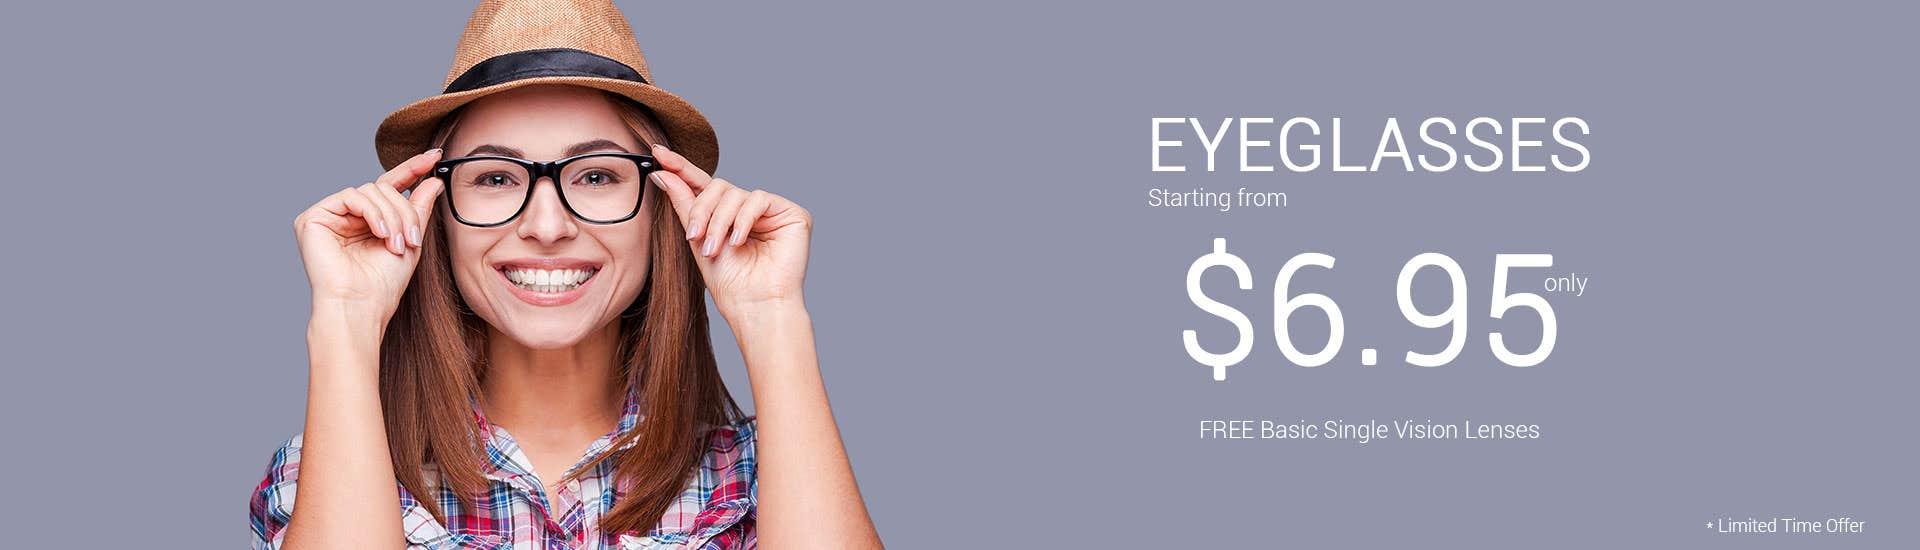 $6.95 Eyeglasses